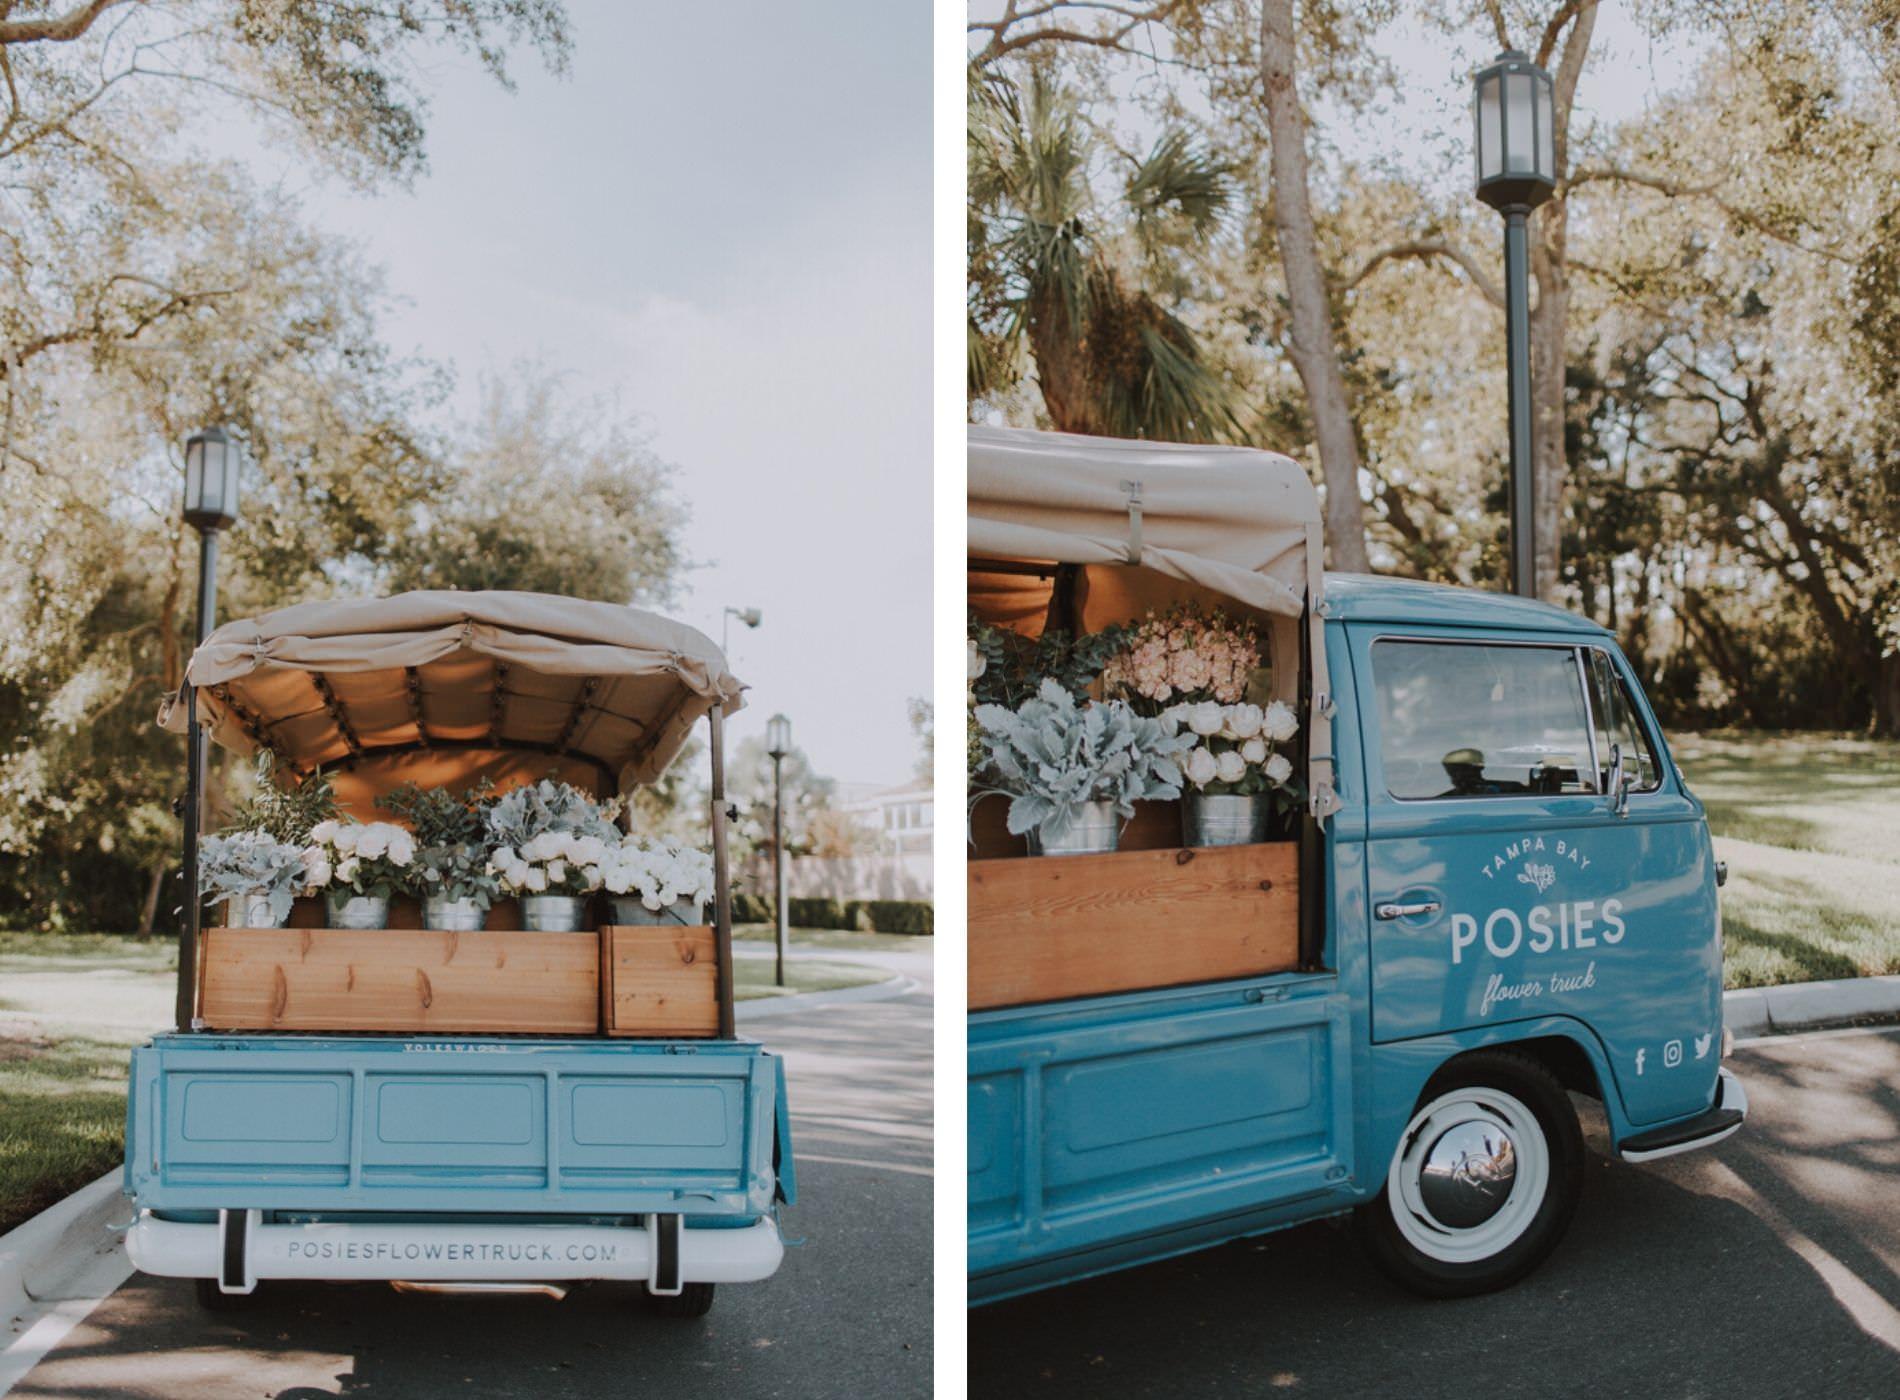 Posies Flower Truck | Unique Tampa Bay Wedding Favors | Bouquet Wedding Favors | Vintage Truck Wedding